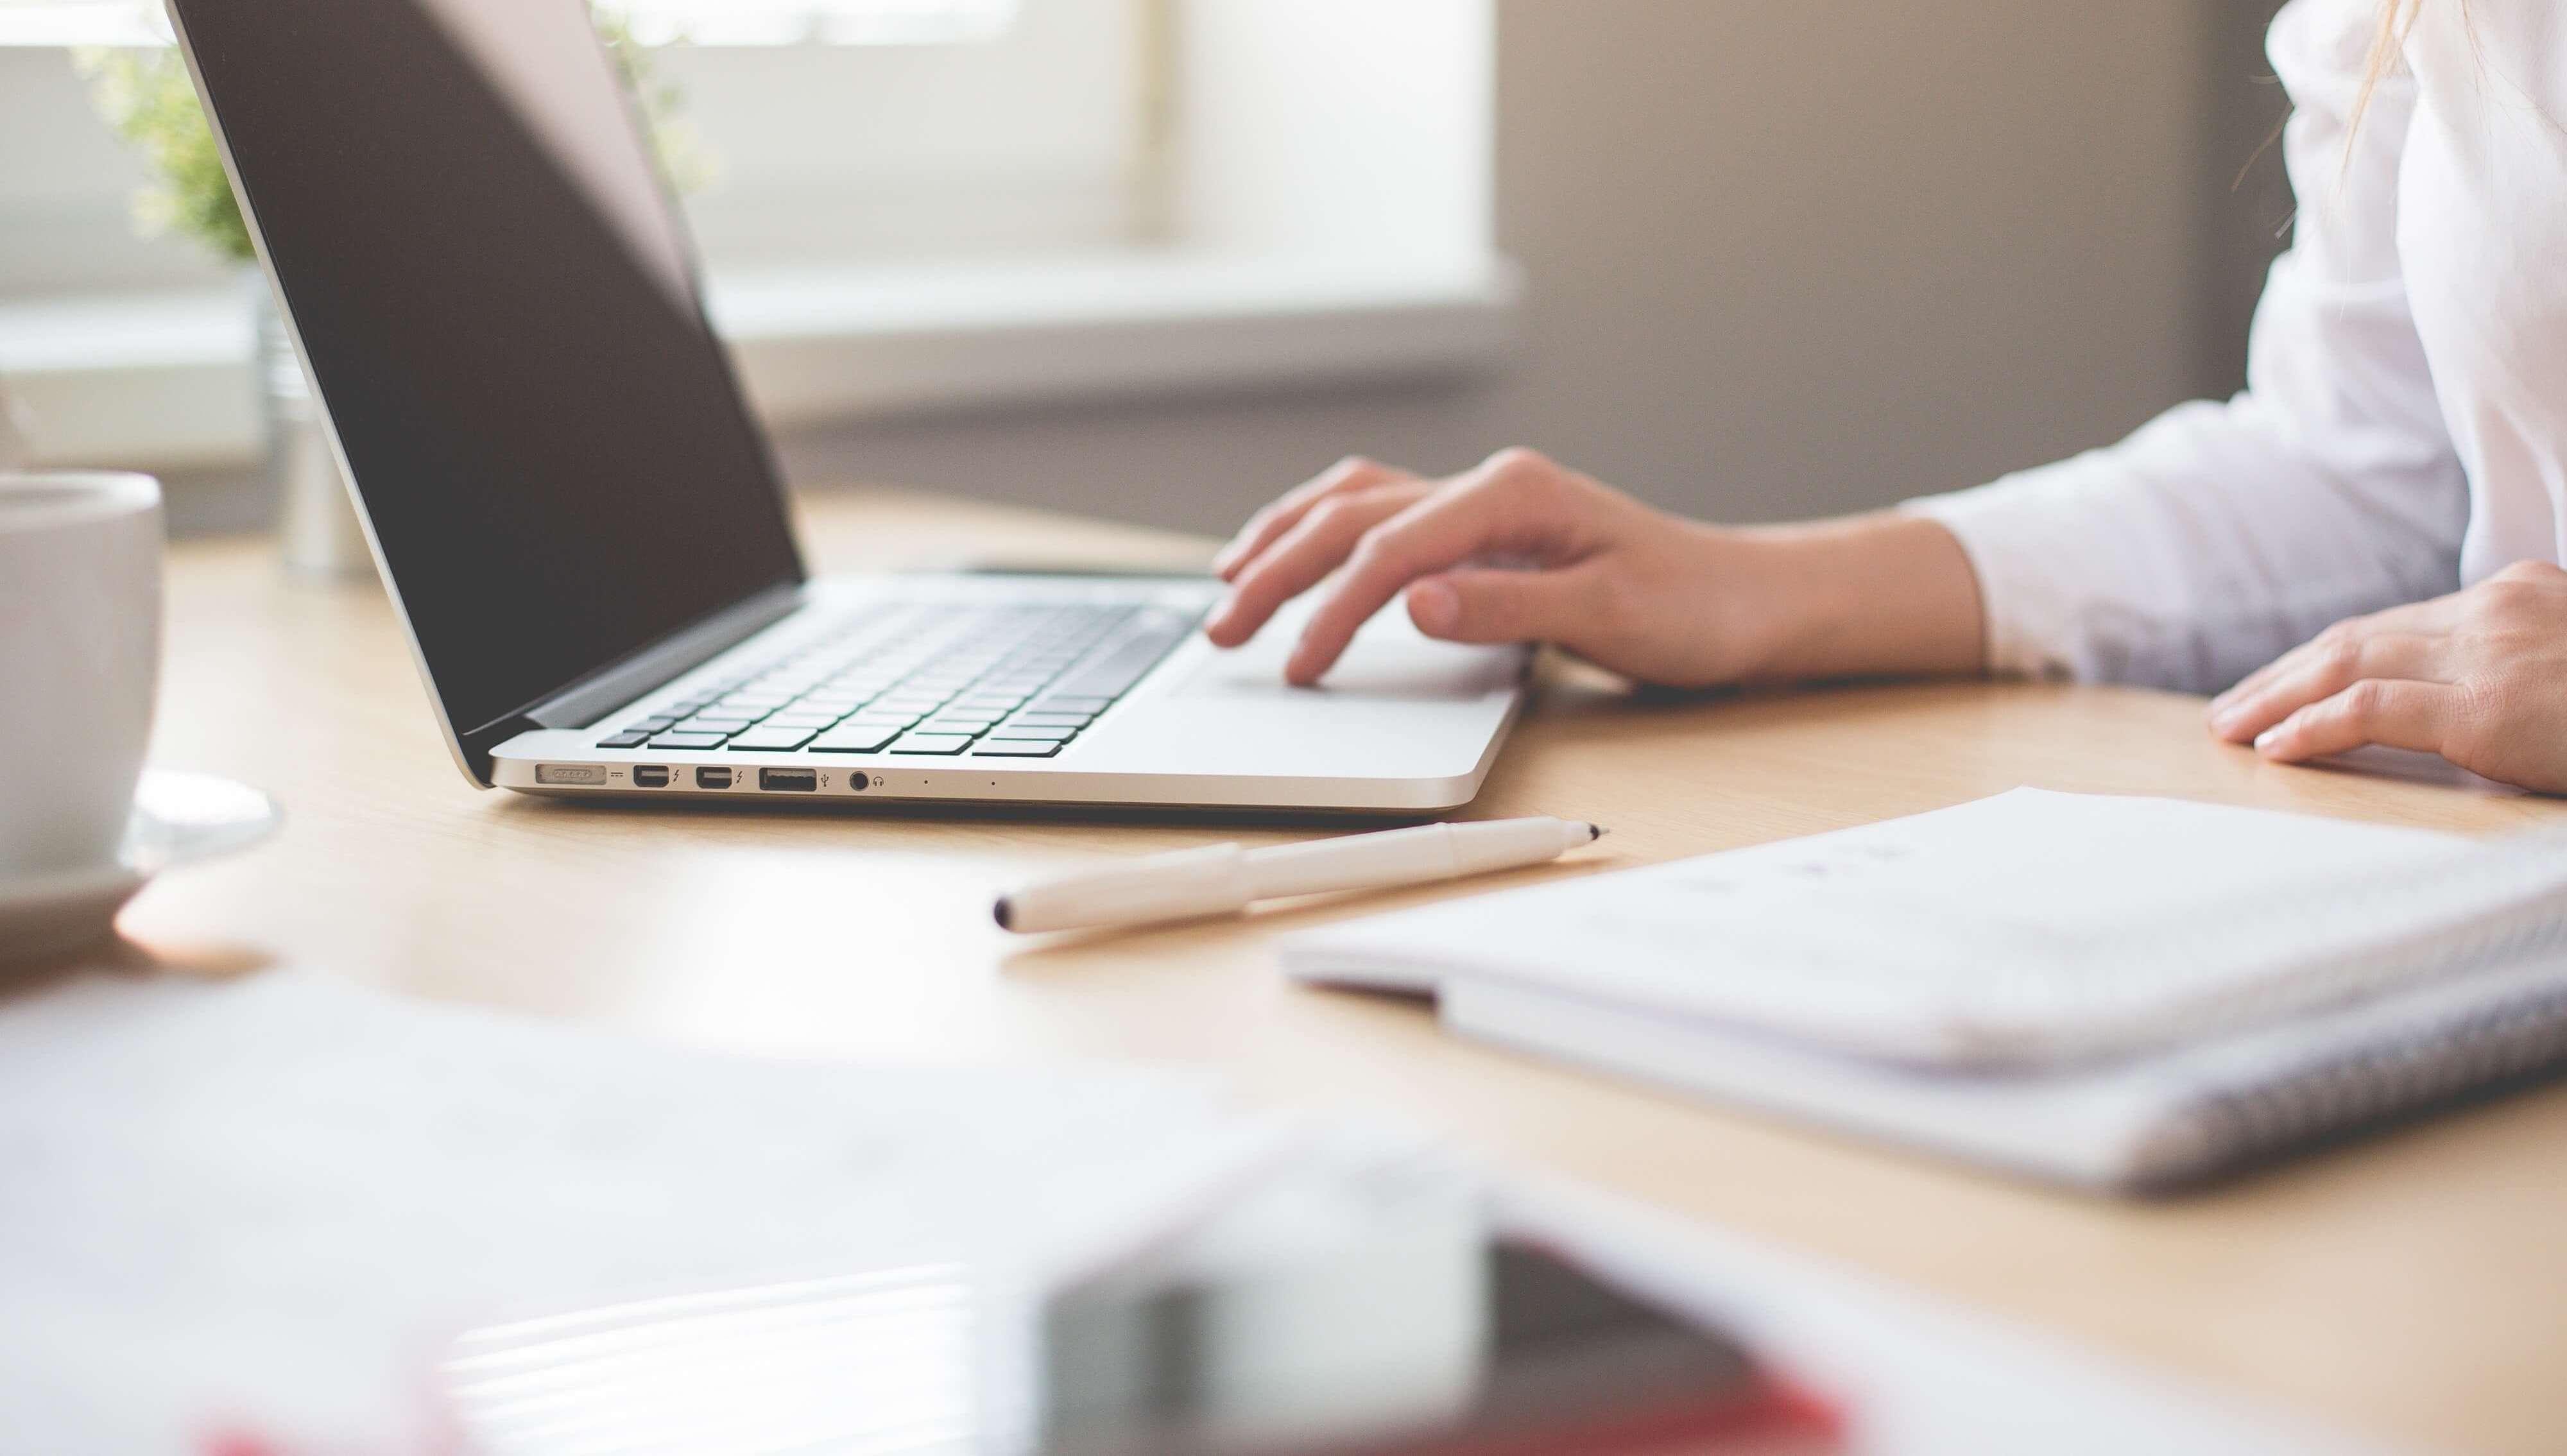 A Few Key Resume Tips